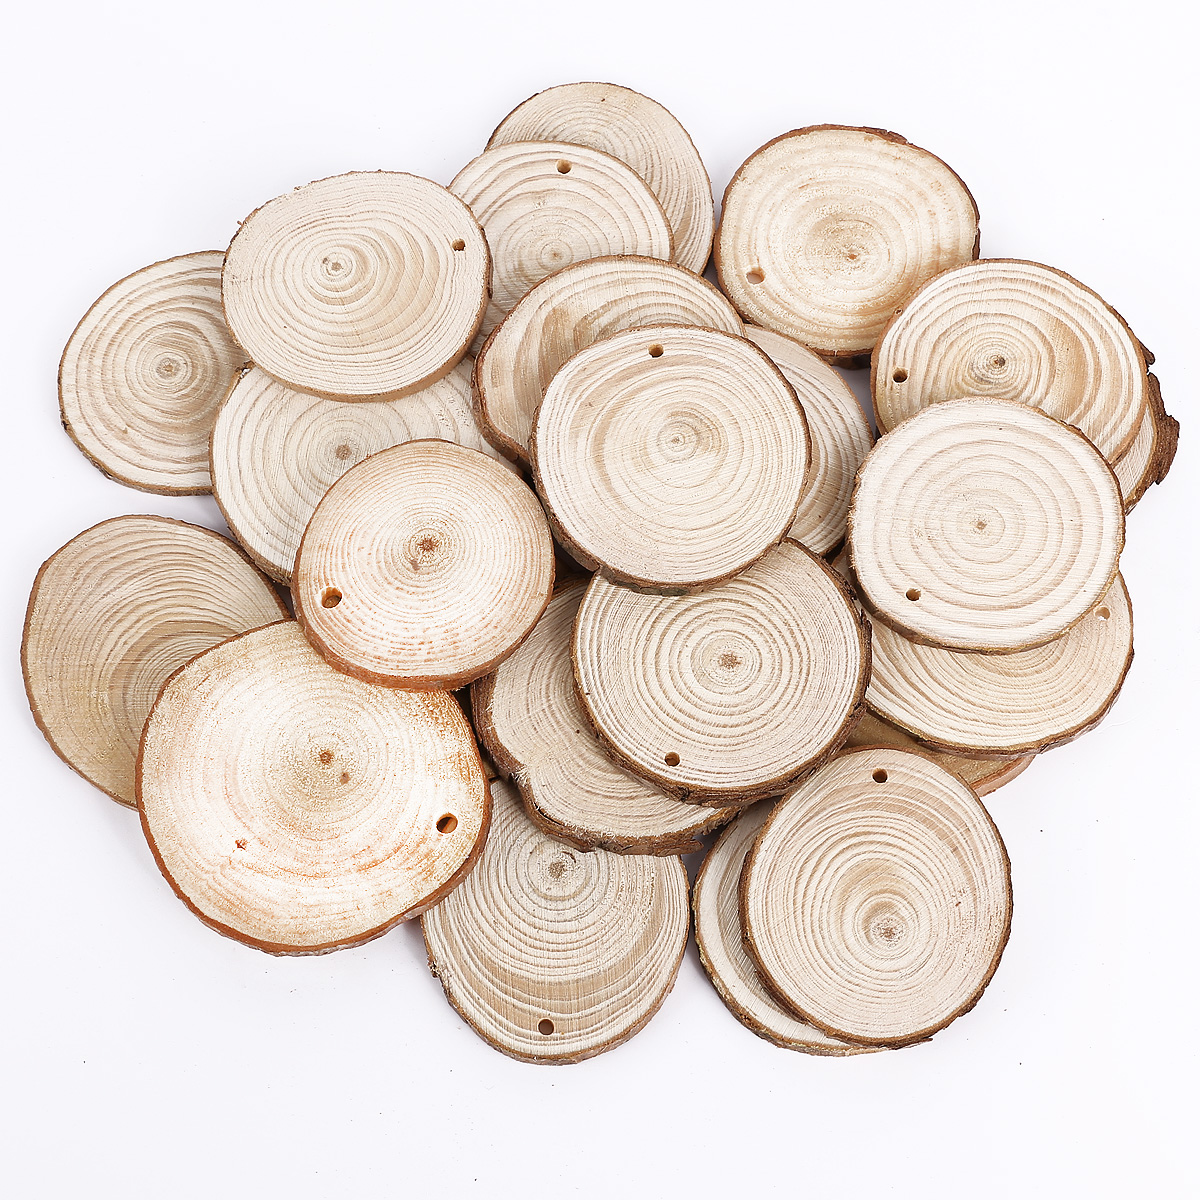 Wooden Wood Log Slices Natural Tree Bark Round Shape Tableware Decor ...